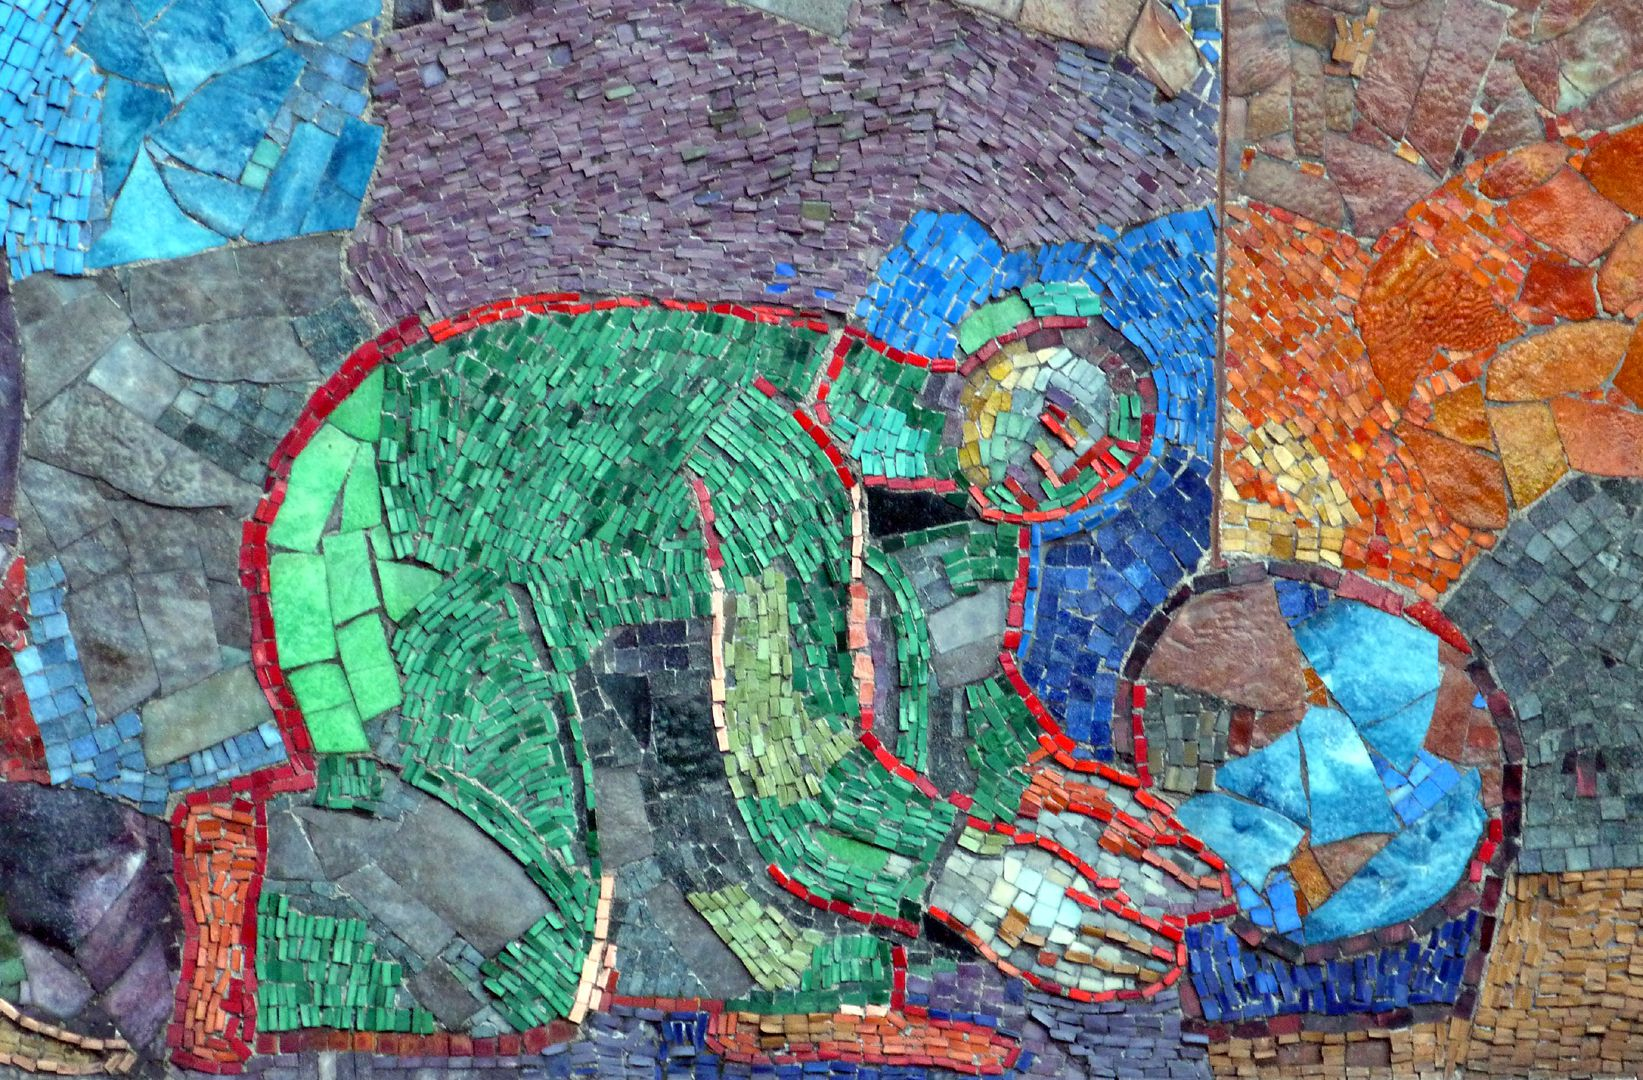 Mosaic on the Main Market (Hauptmarkt) in Nuremberg Suppliers of goods